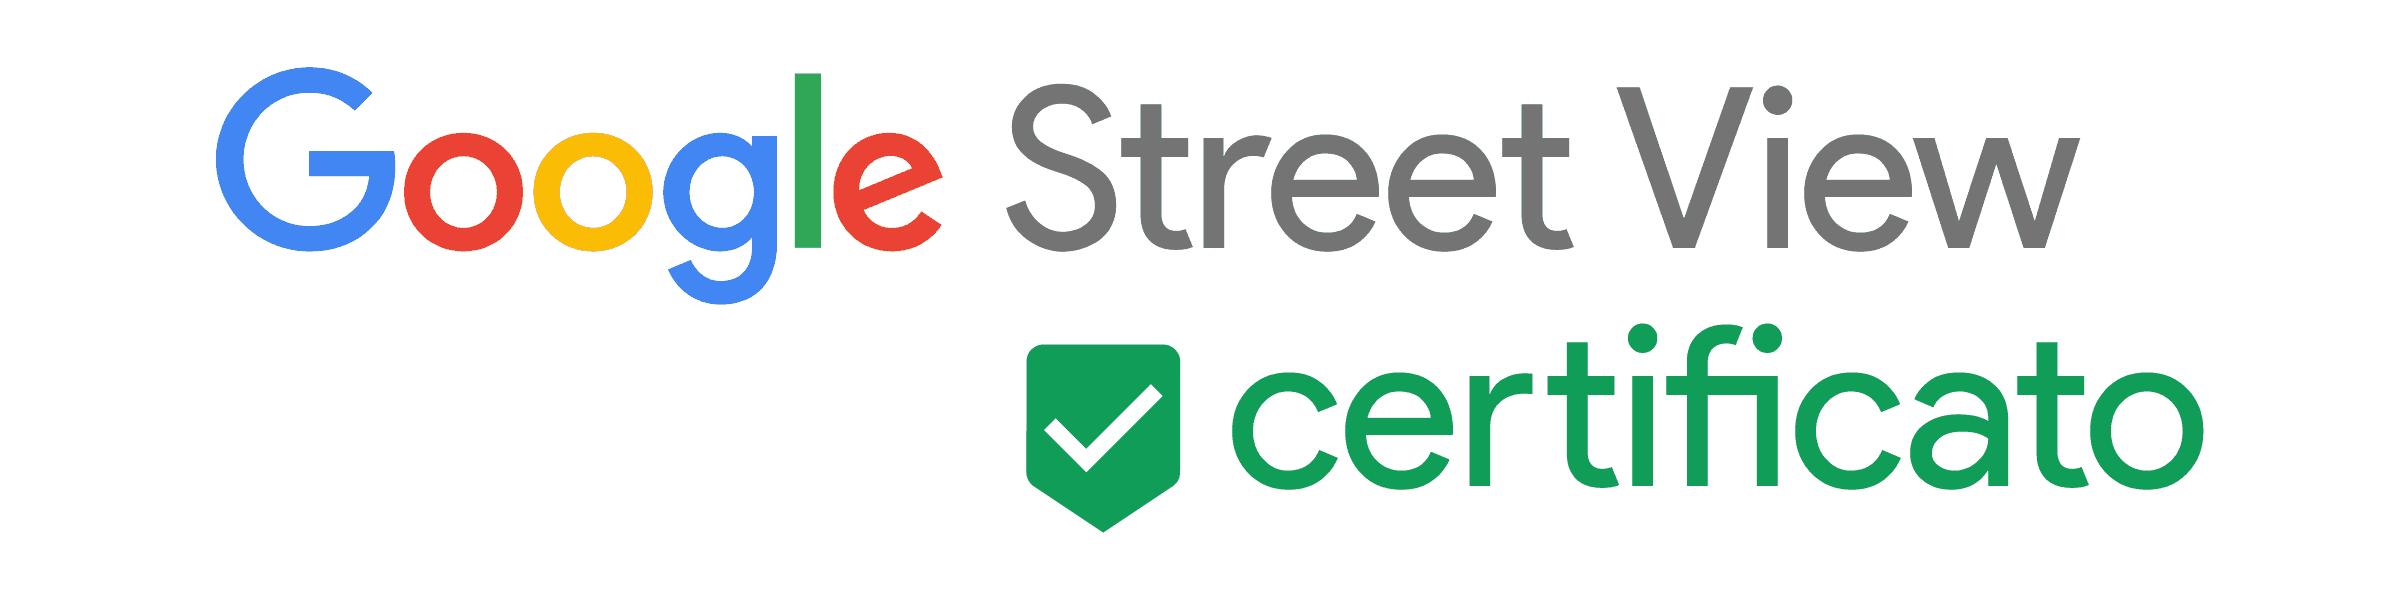 Gianluca Bertoncelli Fotografo Certificato Google Street View e Google Business